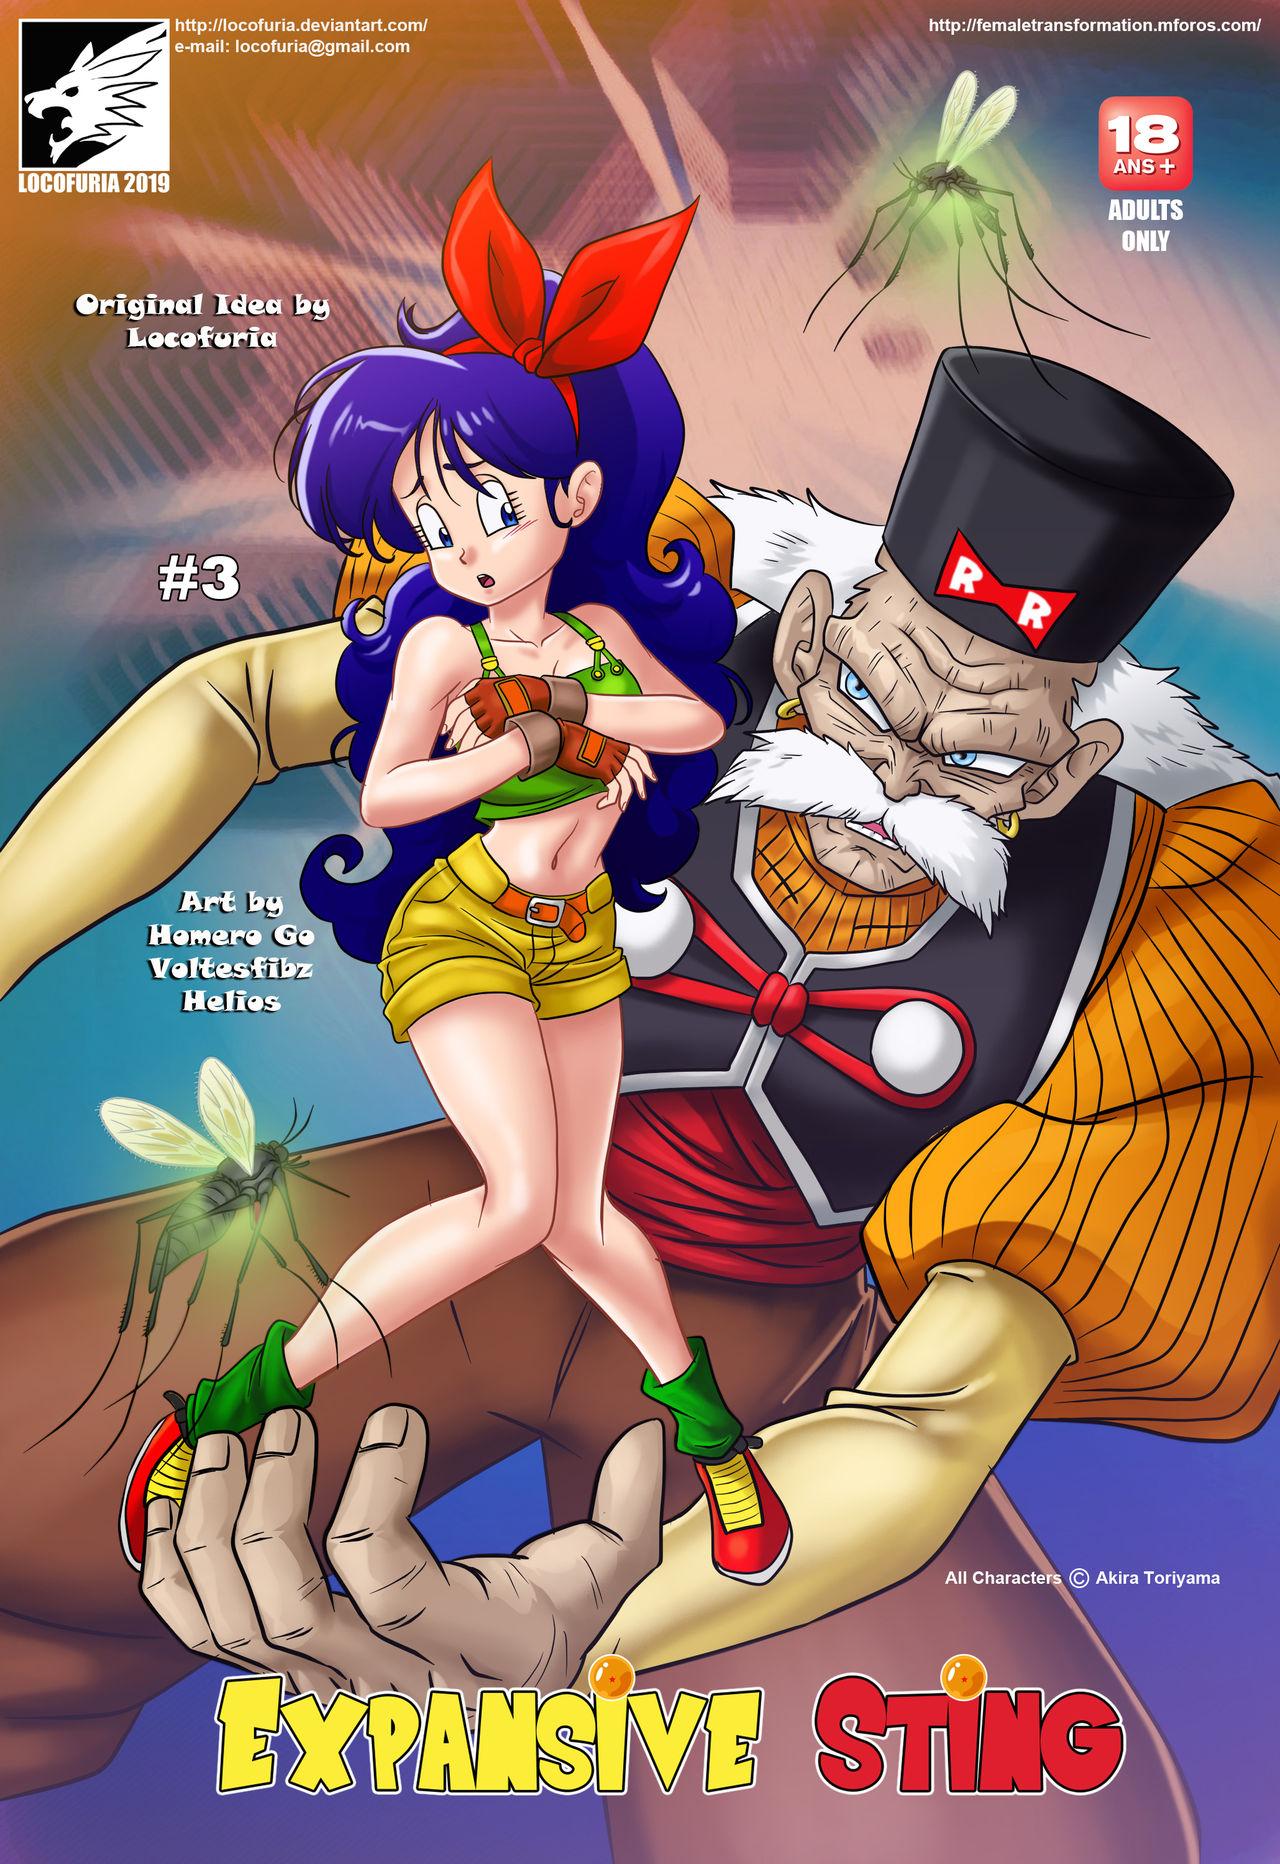 All Anime Porn Comic locofuria – expansive sting 3 (dragon ball z) | porn comics